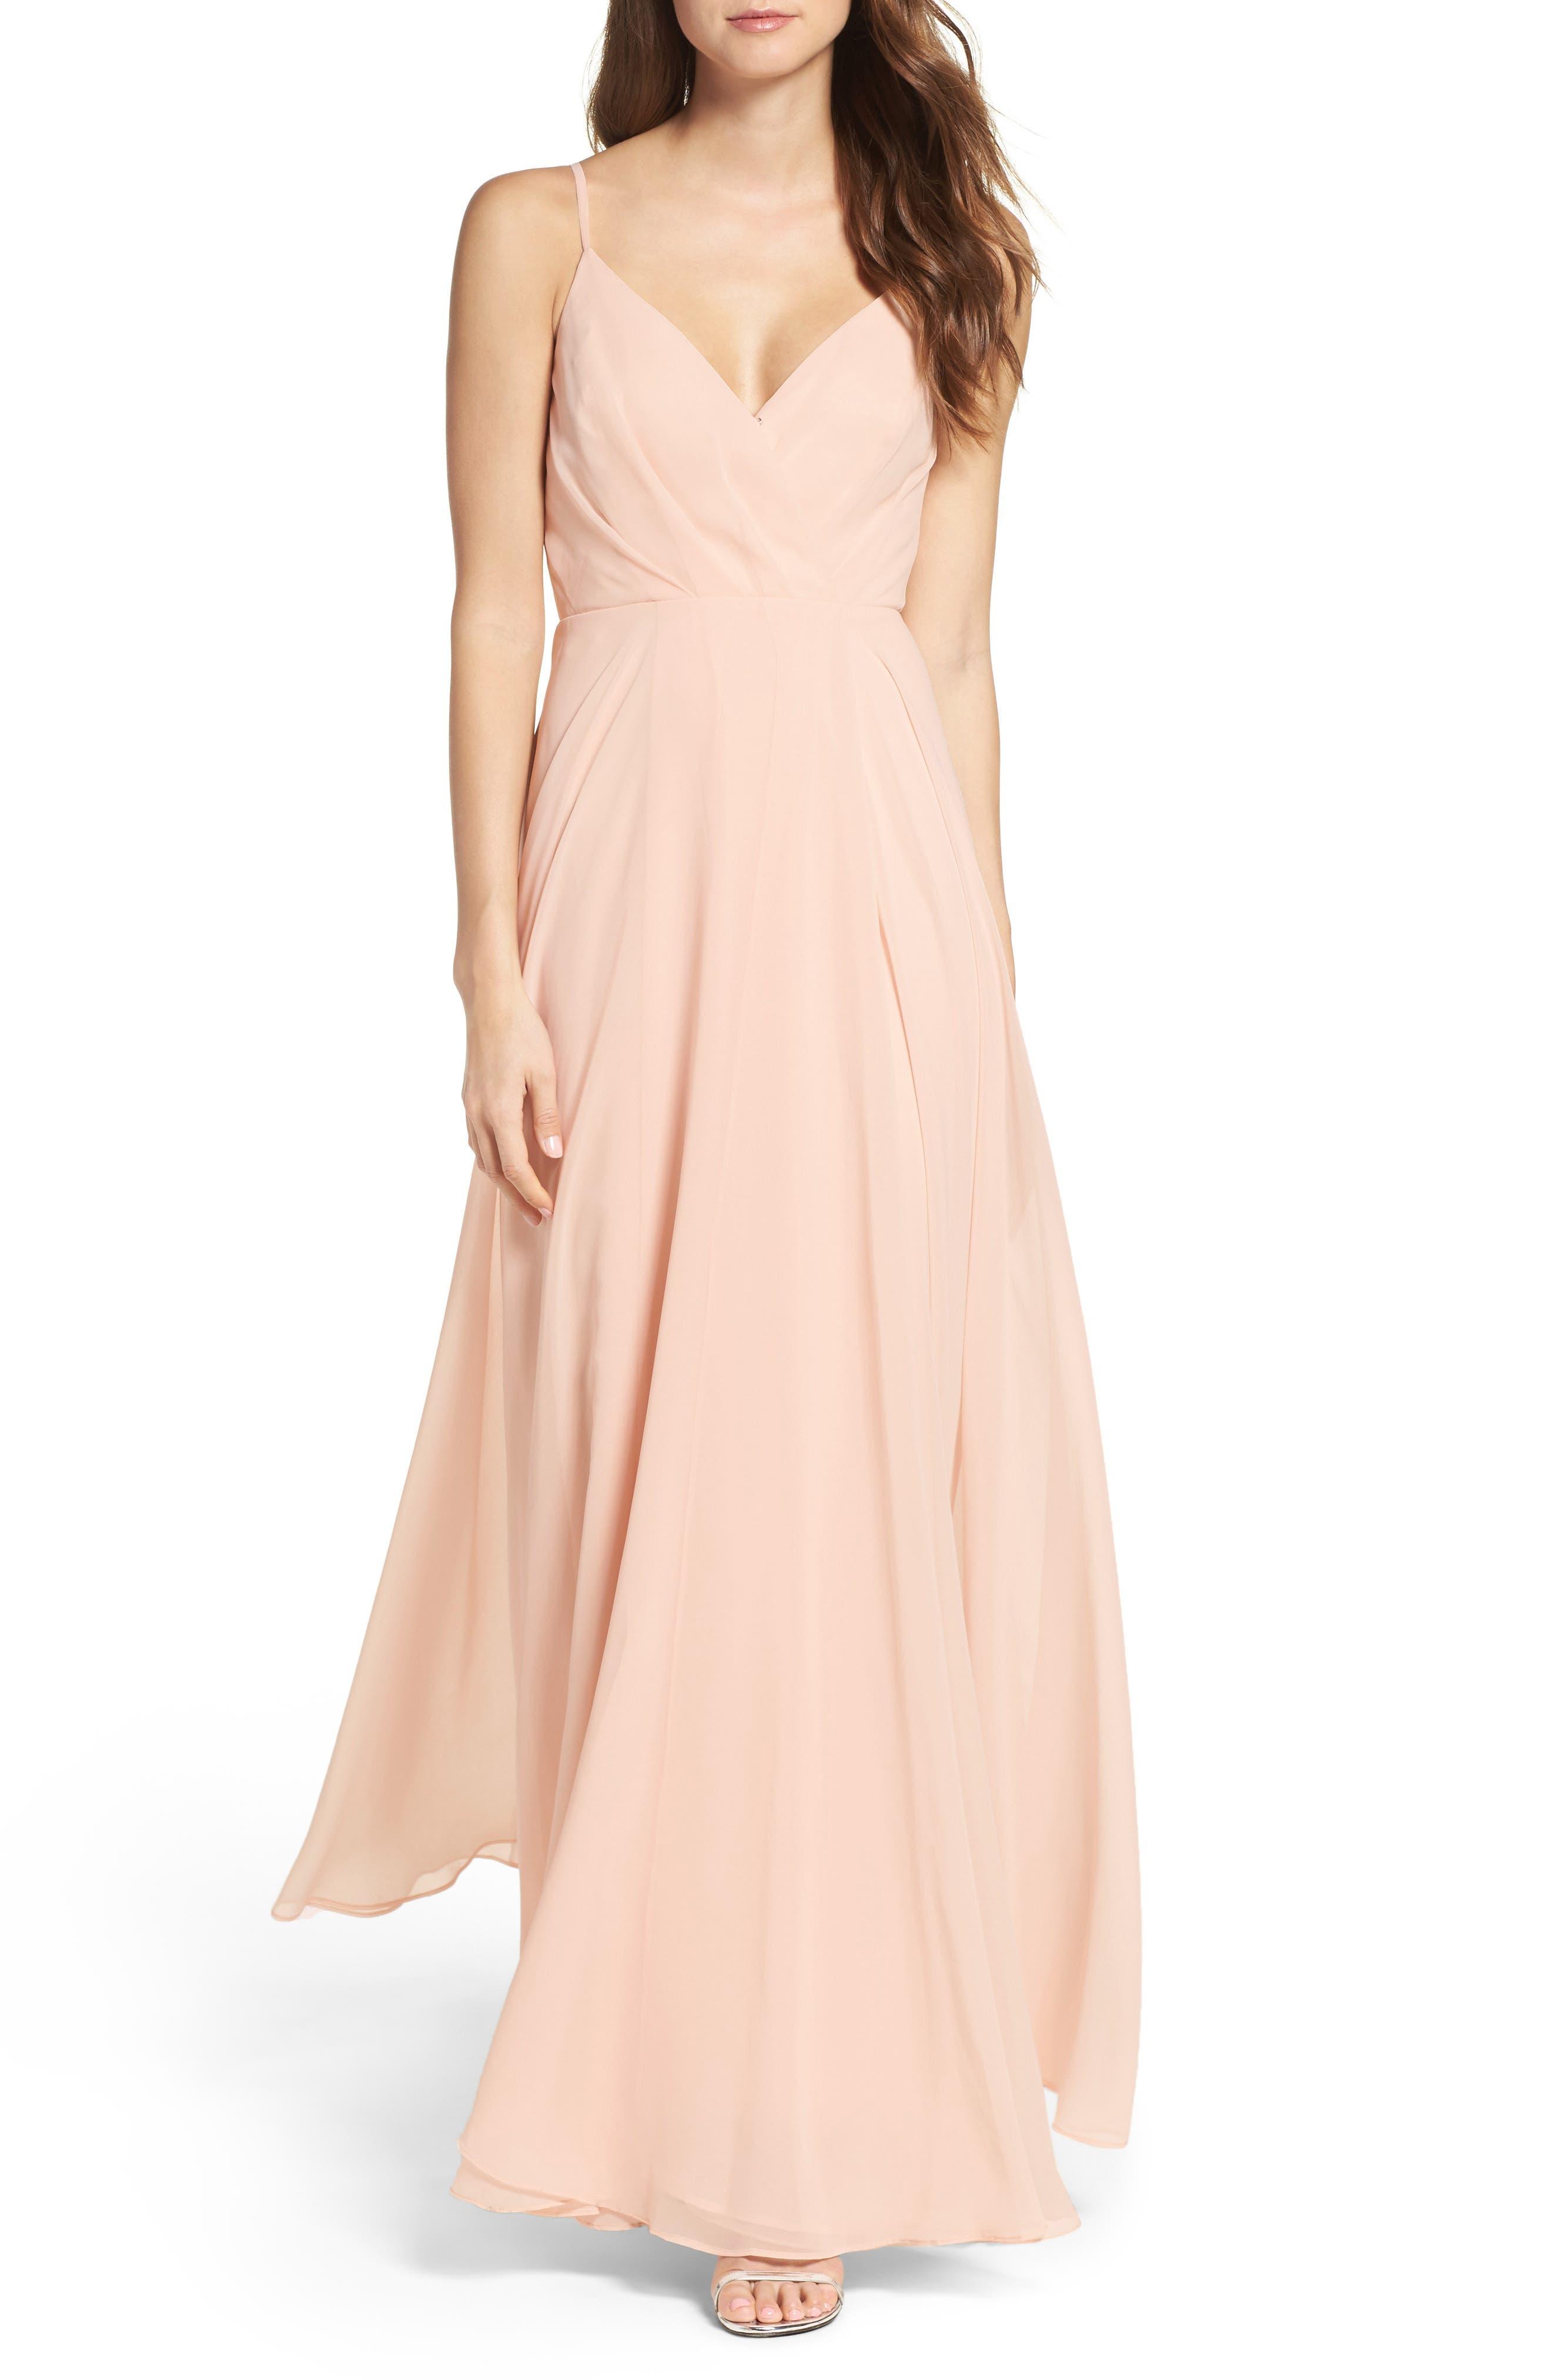 Pink Women Dresses – Fashion dresses